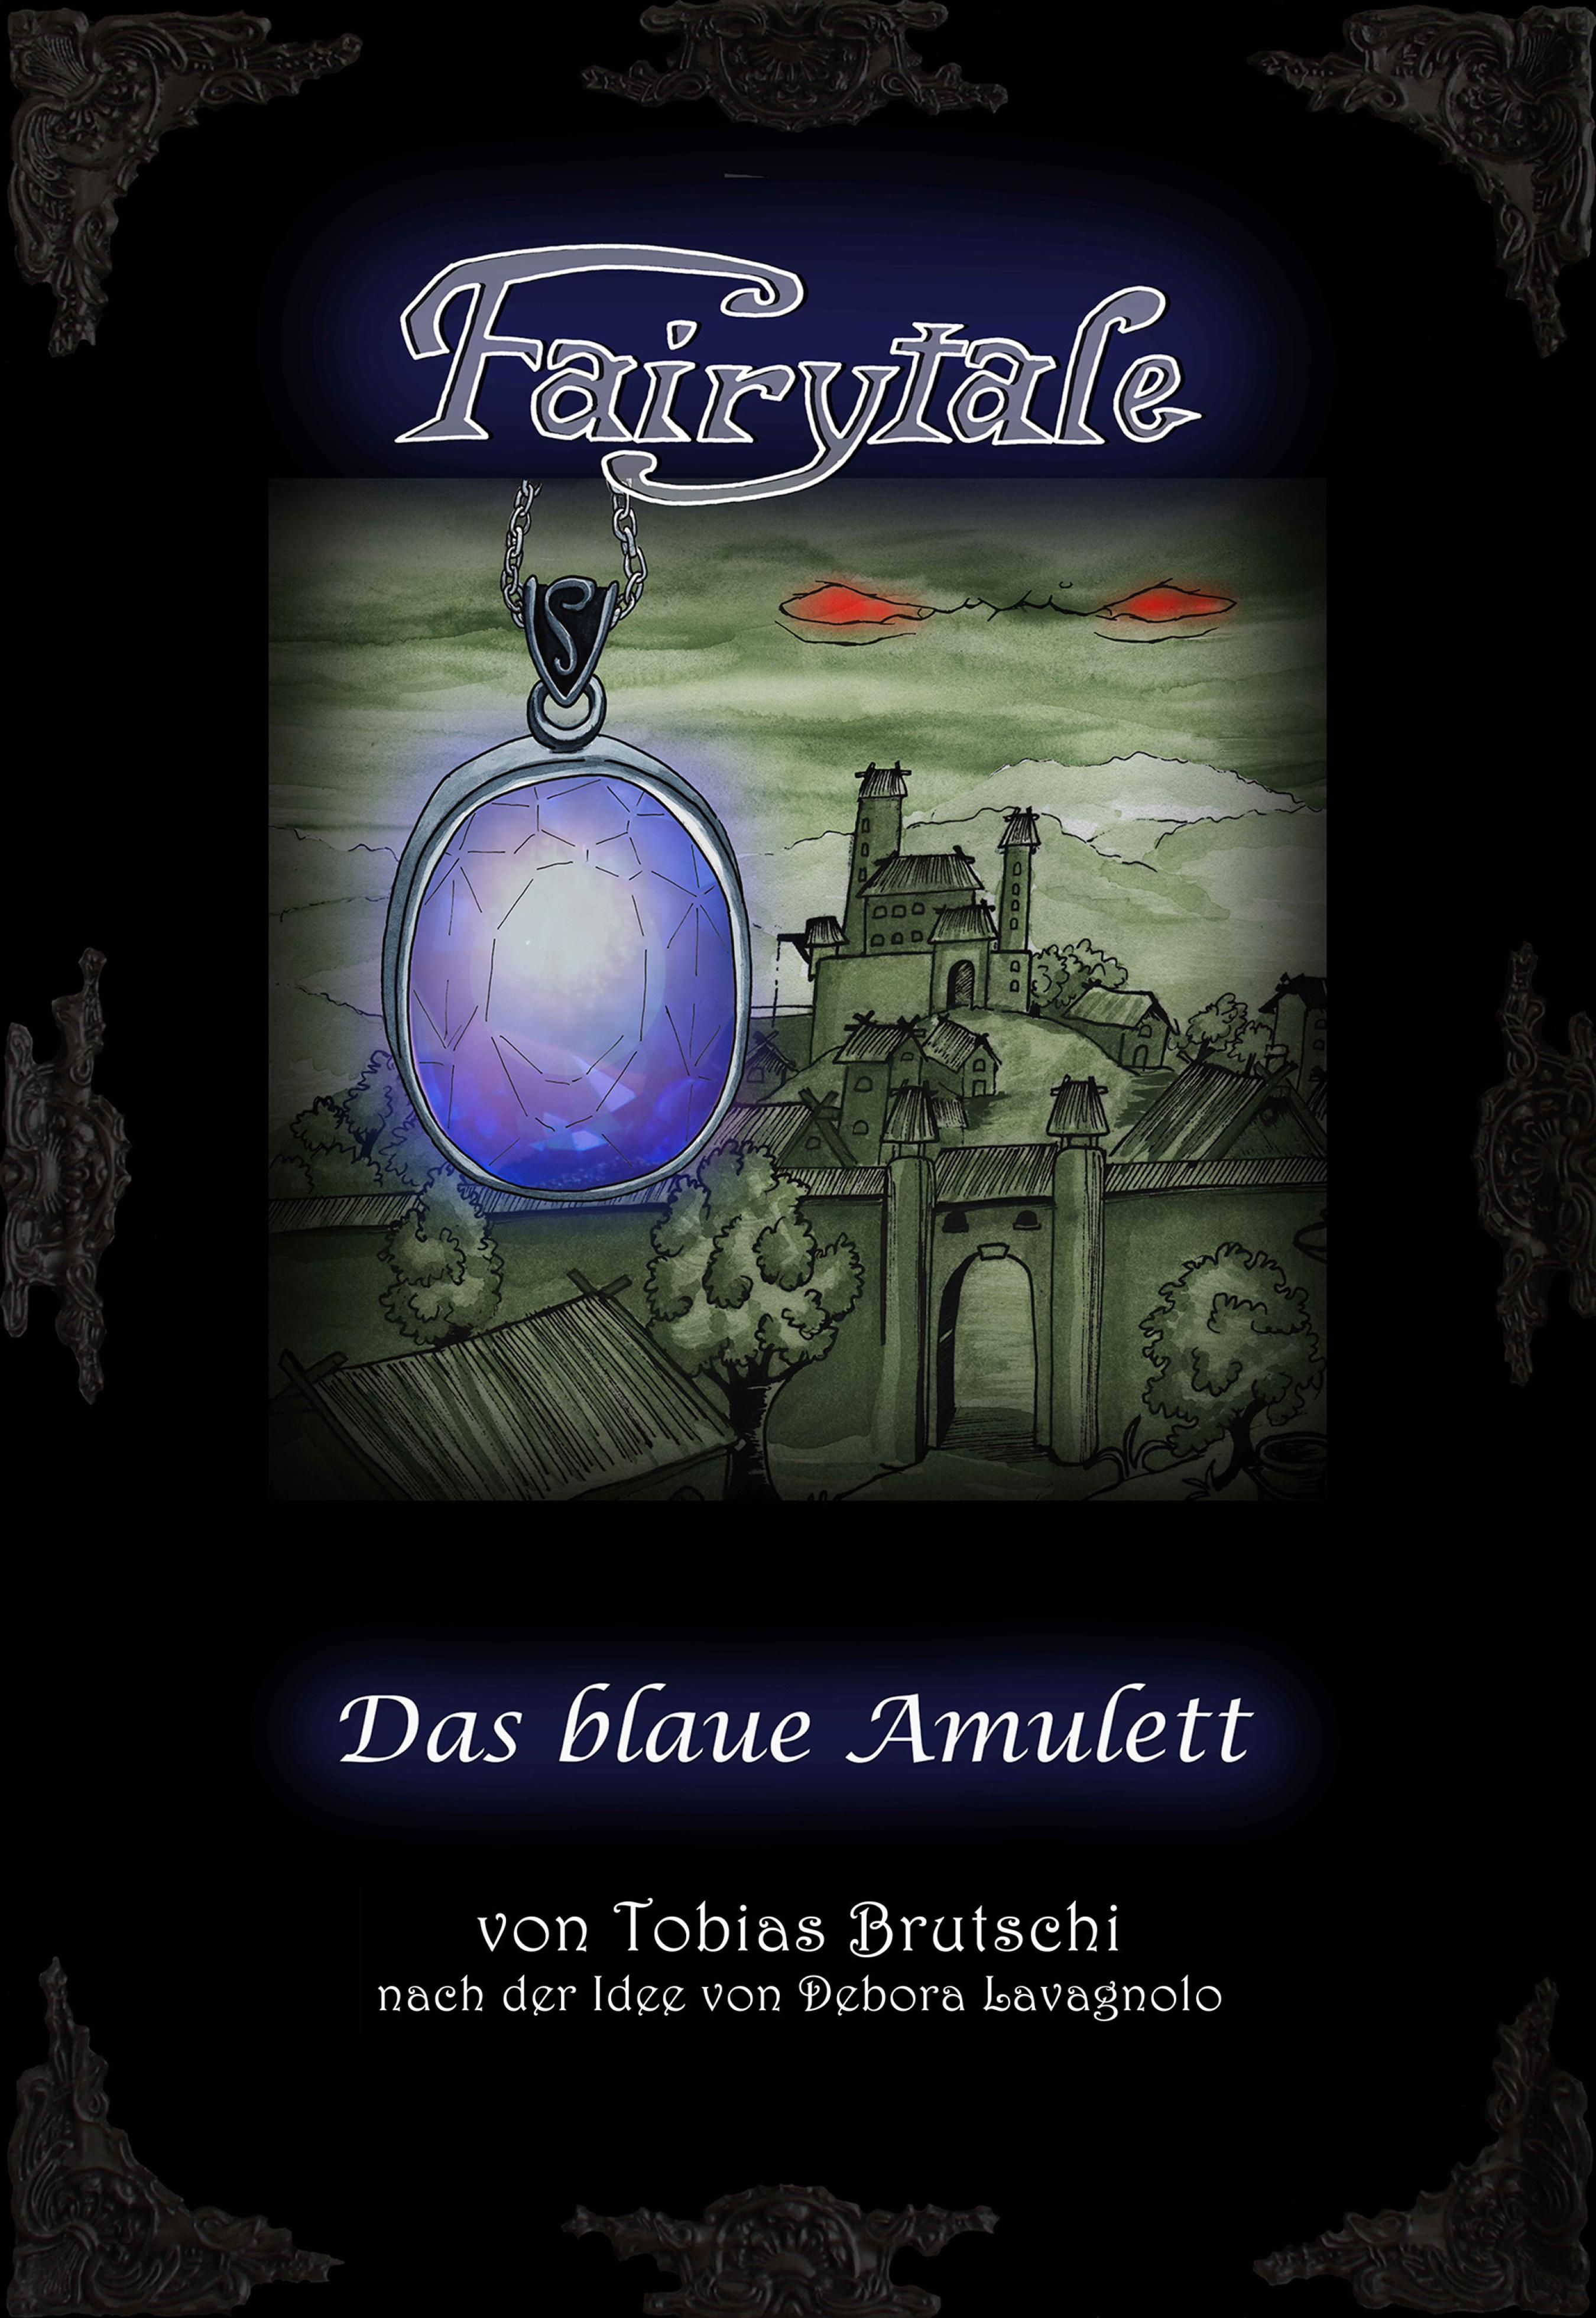 цена Tobias Brutschi Das blaue Amulett онлайн в 2017 году